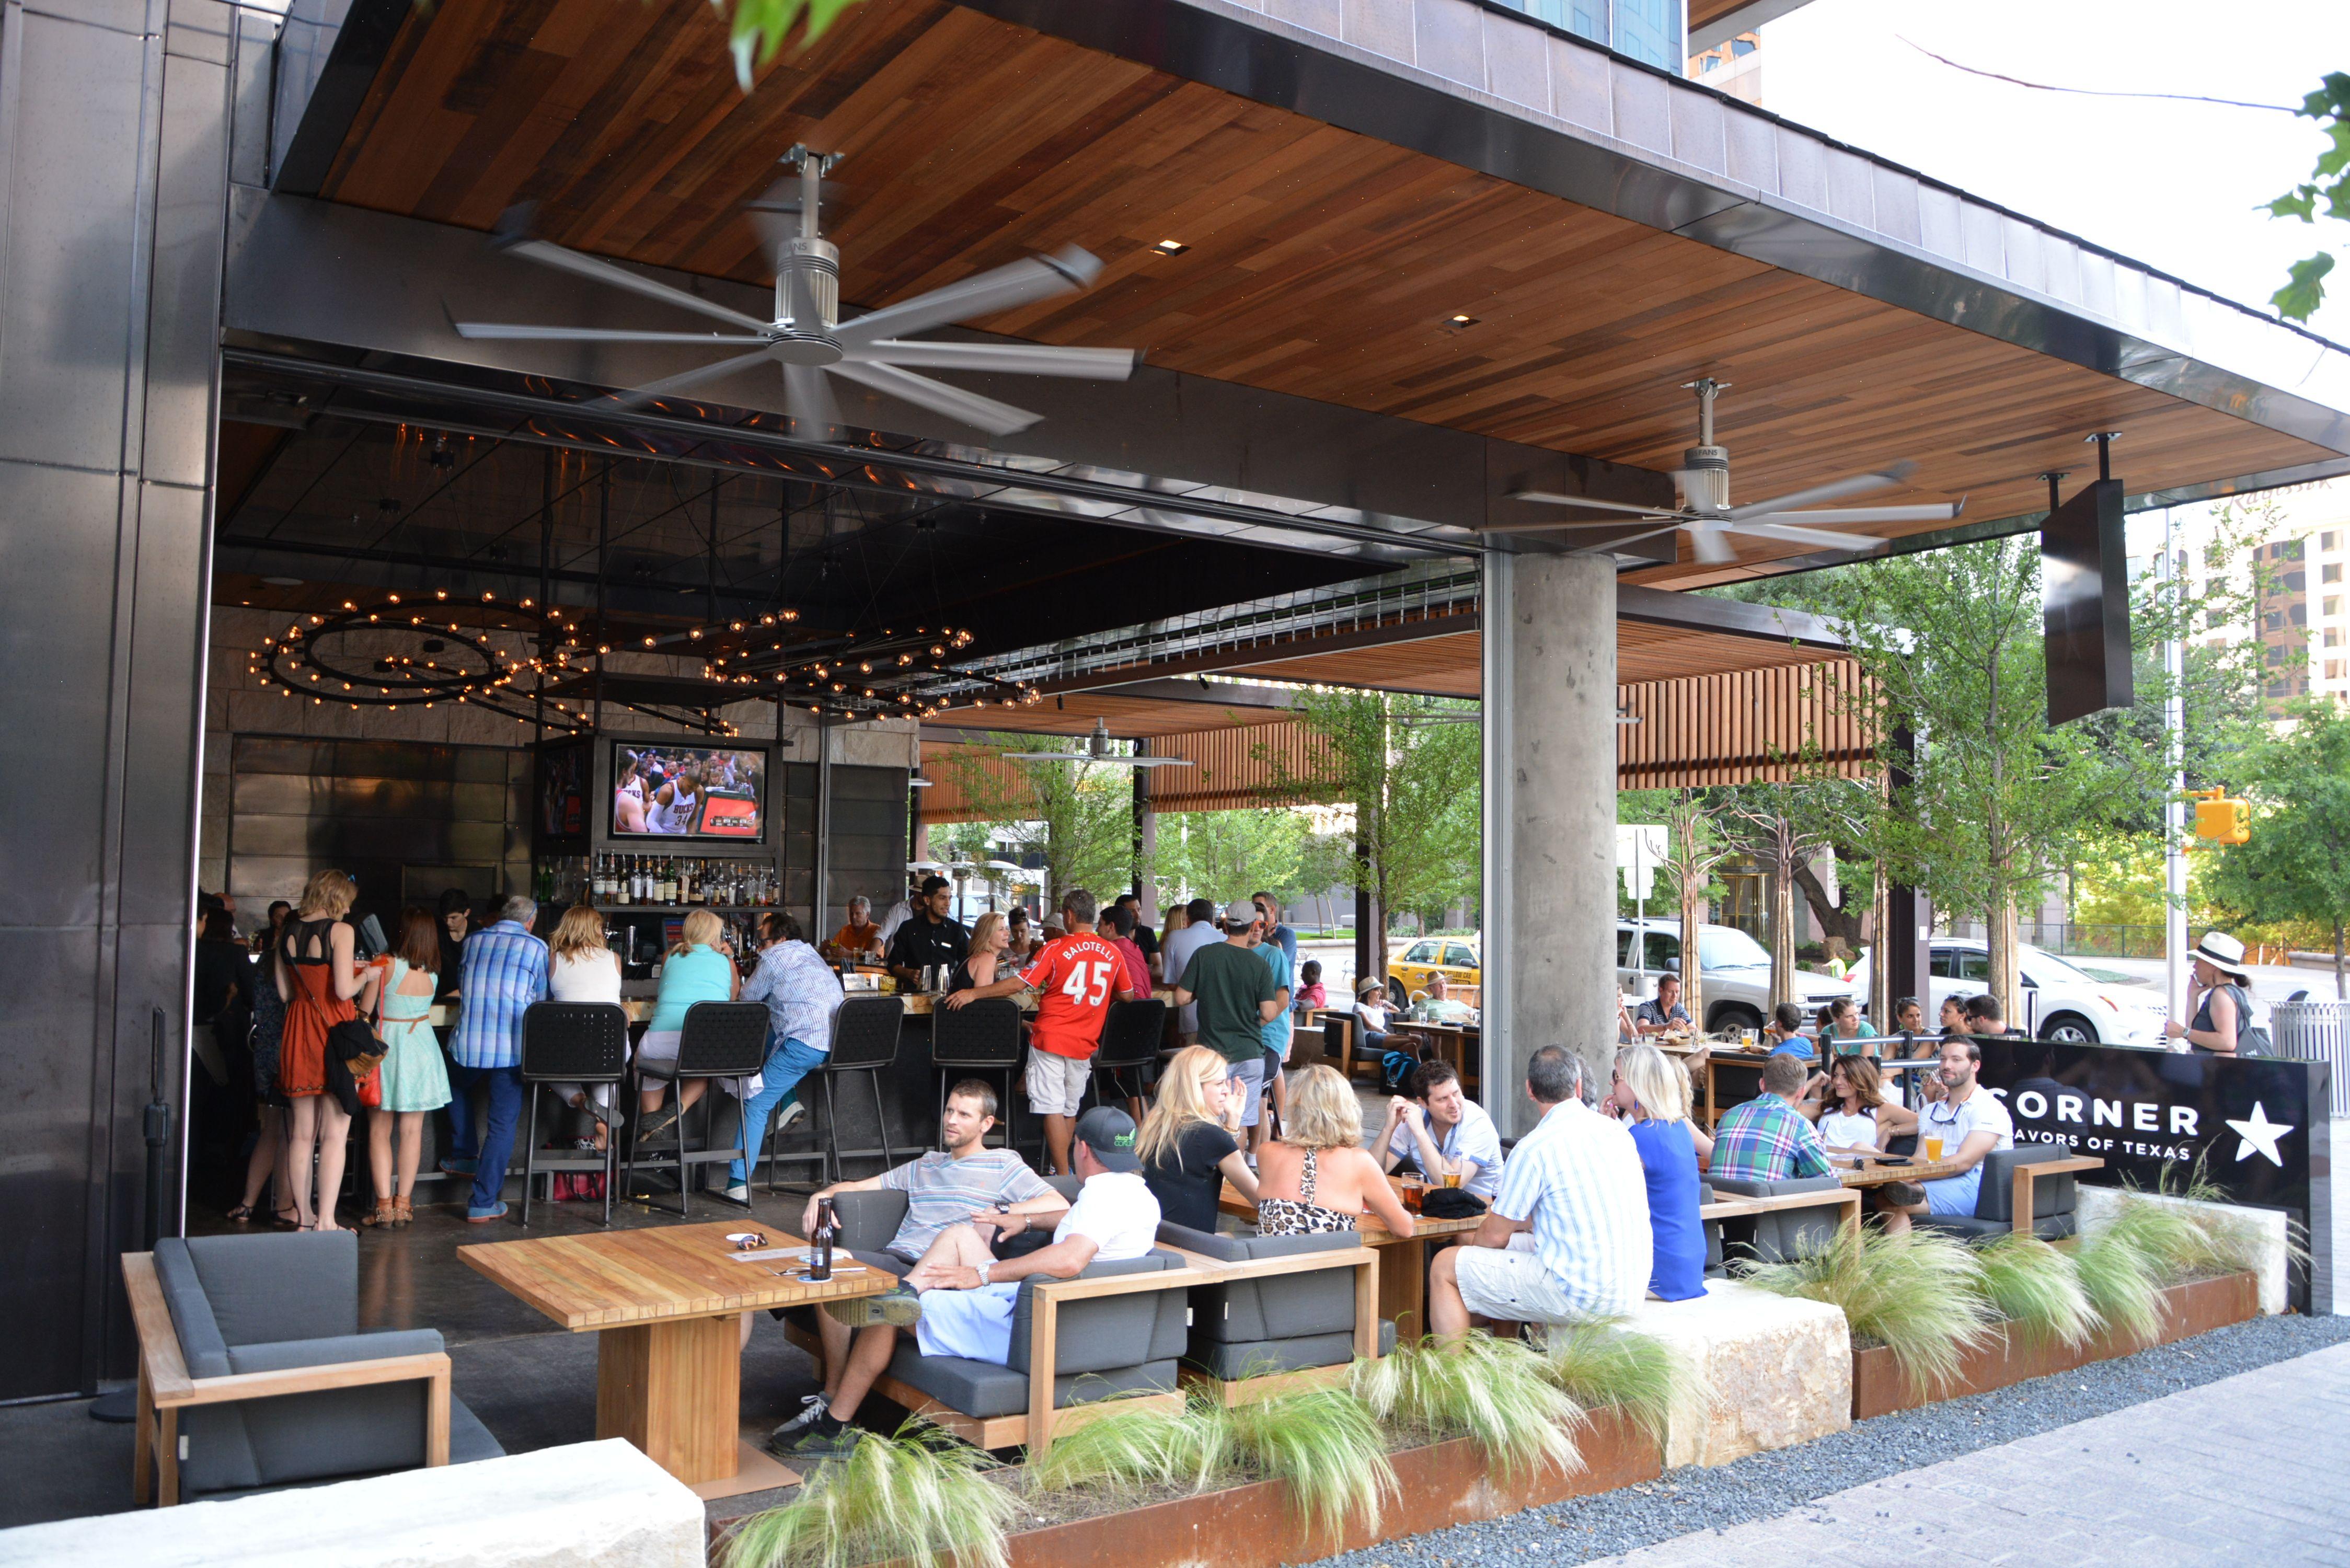 The Corner Bar At Jw Marriott Austin Tx